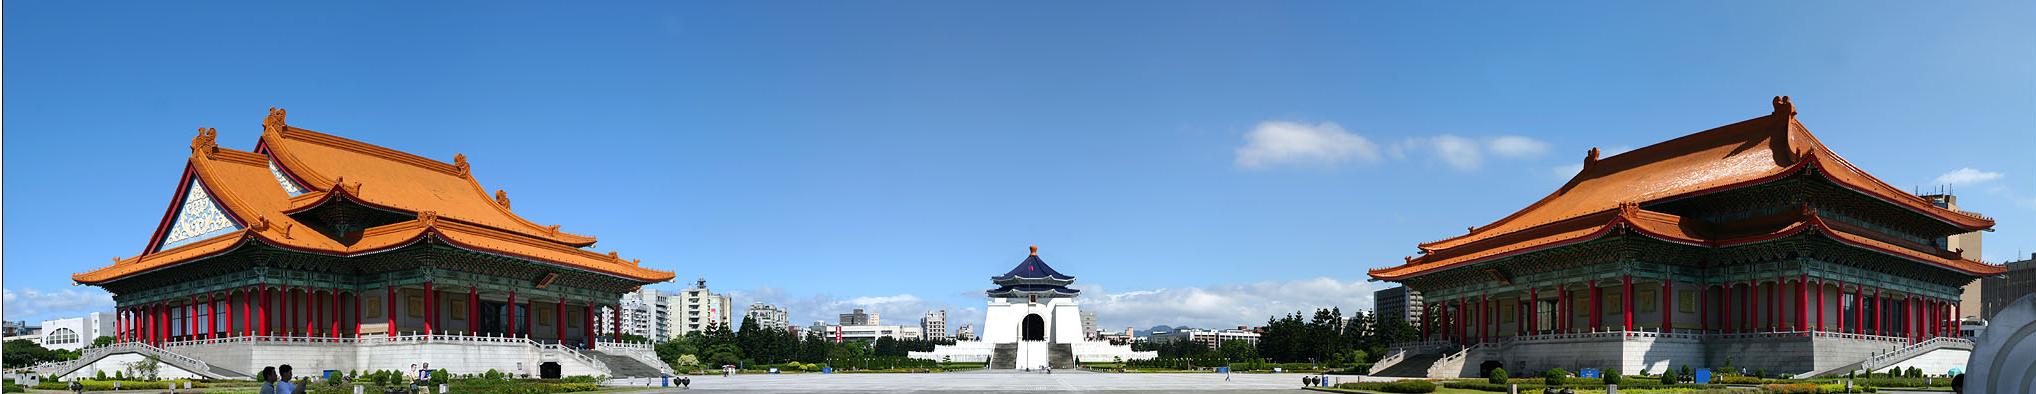 Chiang Kai-Shek Memorial Hall Panorama